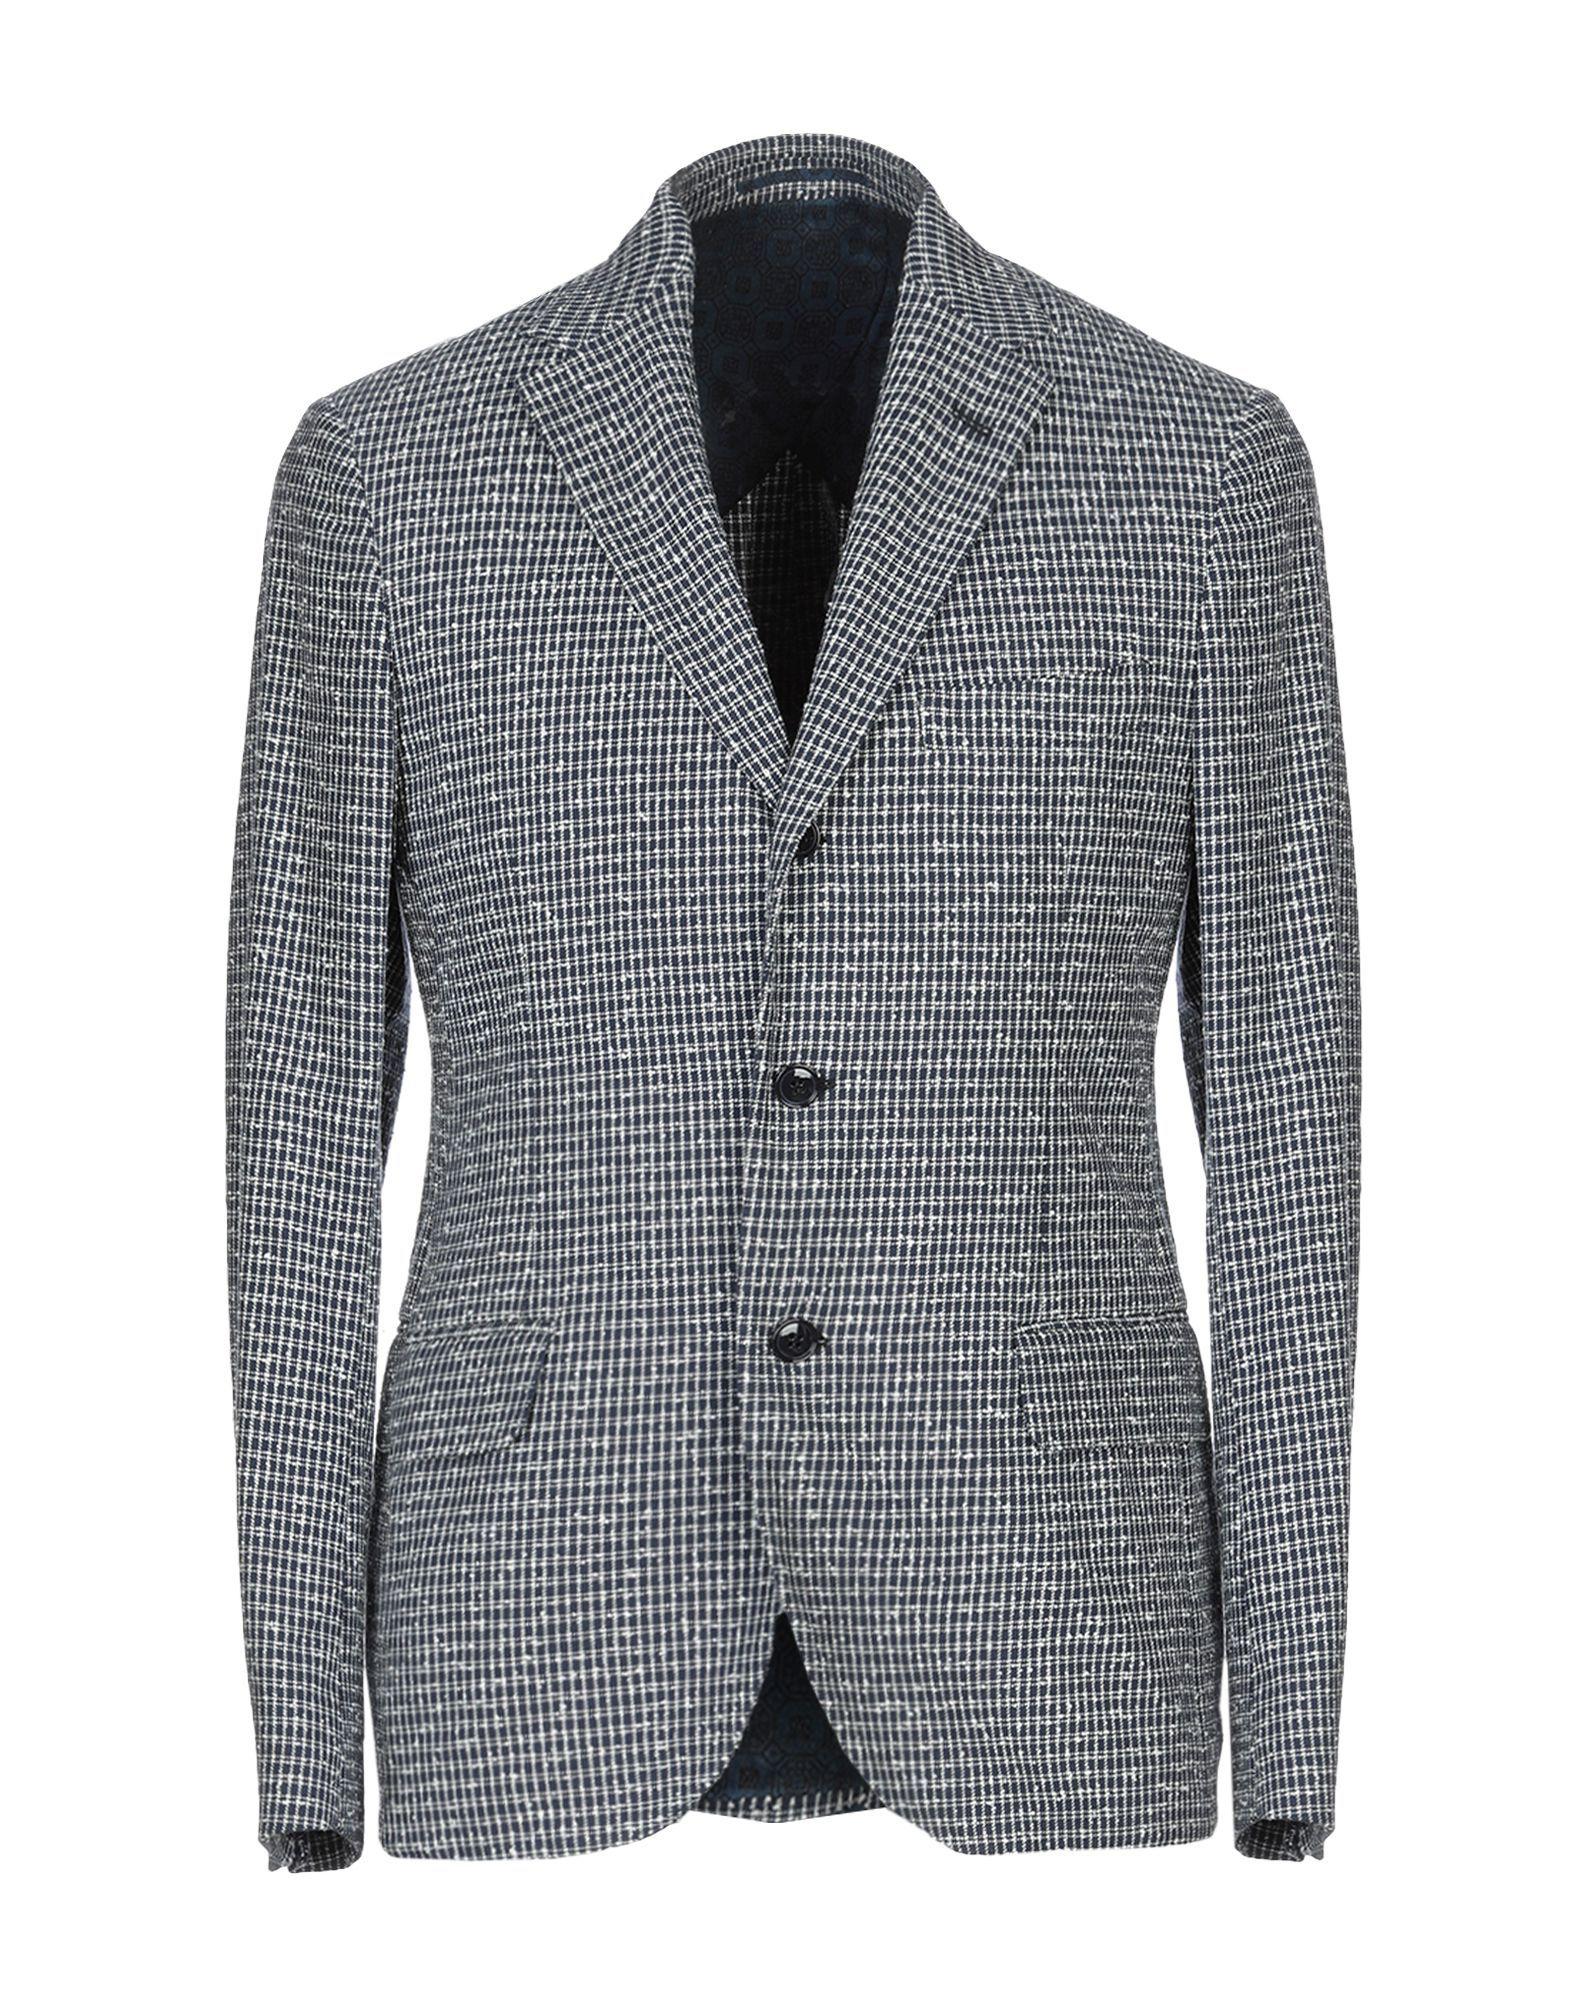 Mp Massimo Piombo Dark Blue Cotton Jacquard Blazer